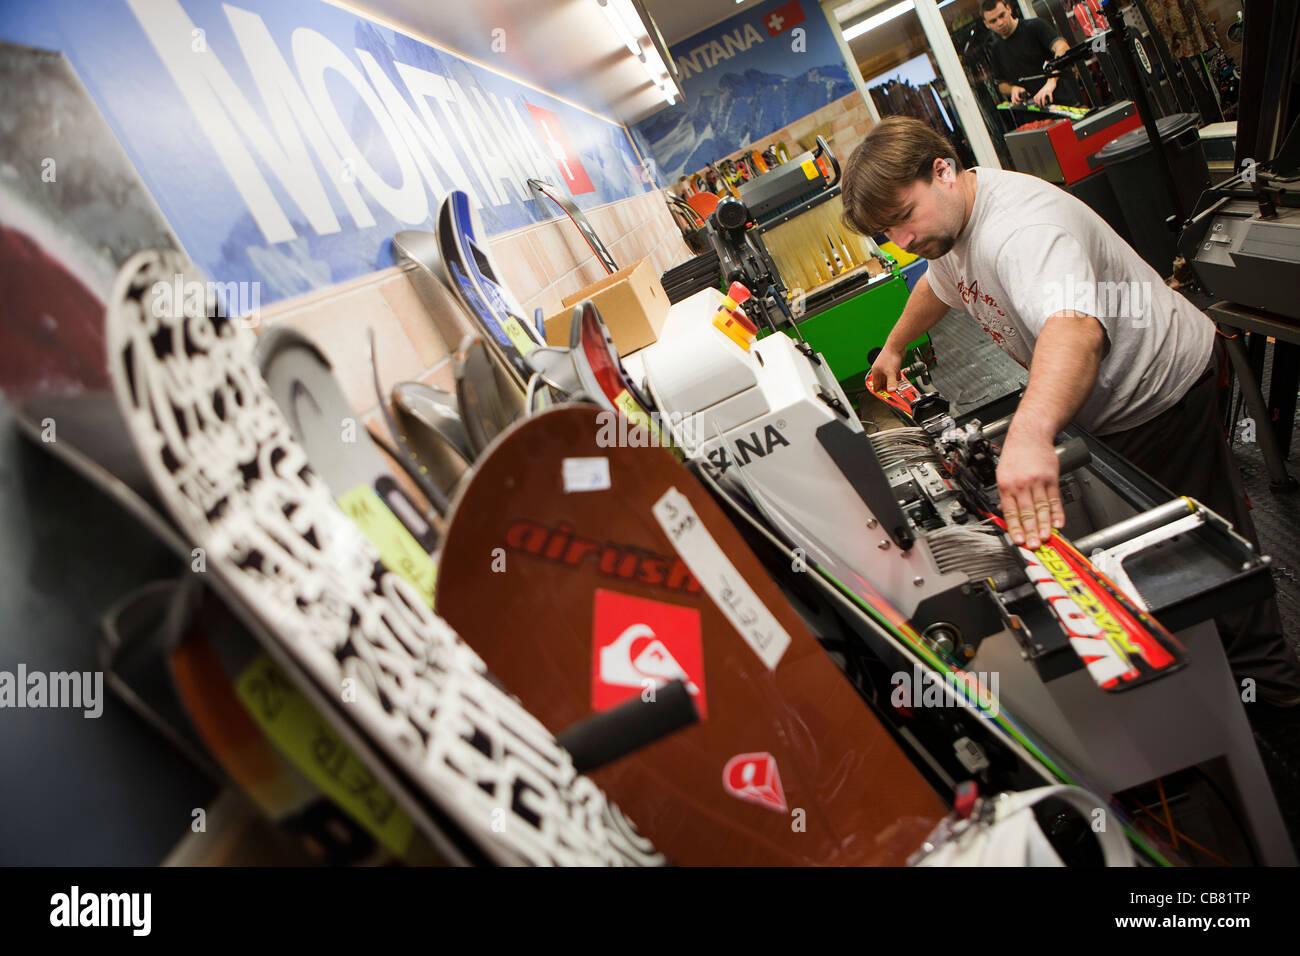 Ski rental service in Prague on November 23, 2011. Service man waxes ski. (CTK Photo/Martin Sterba) - Stock Image